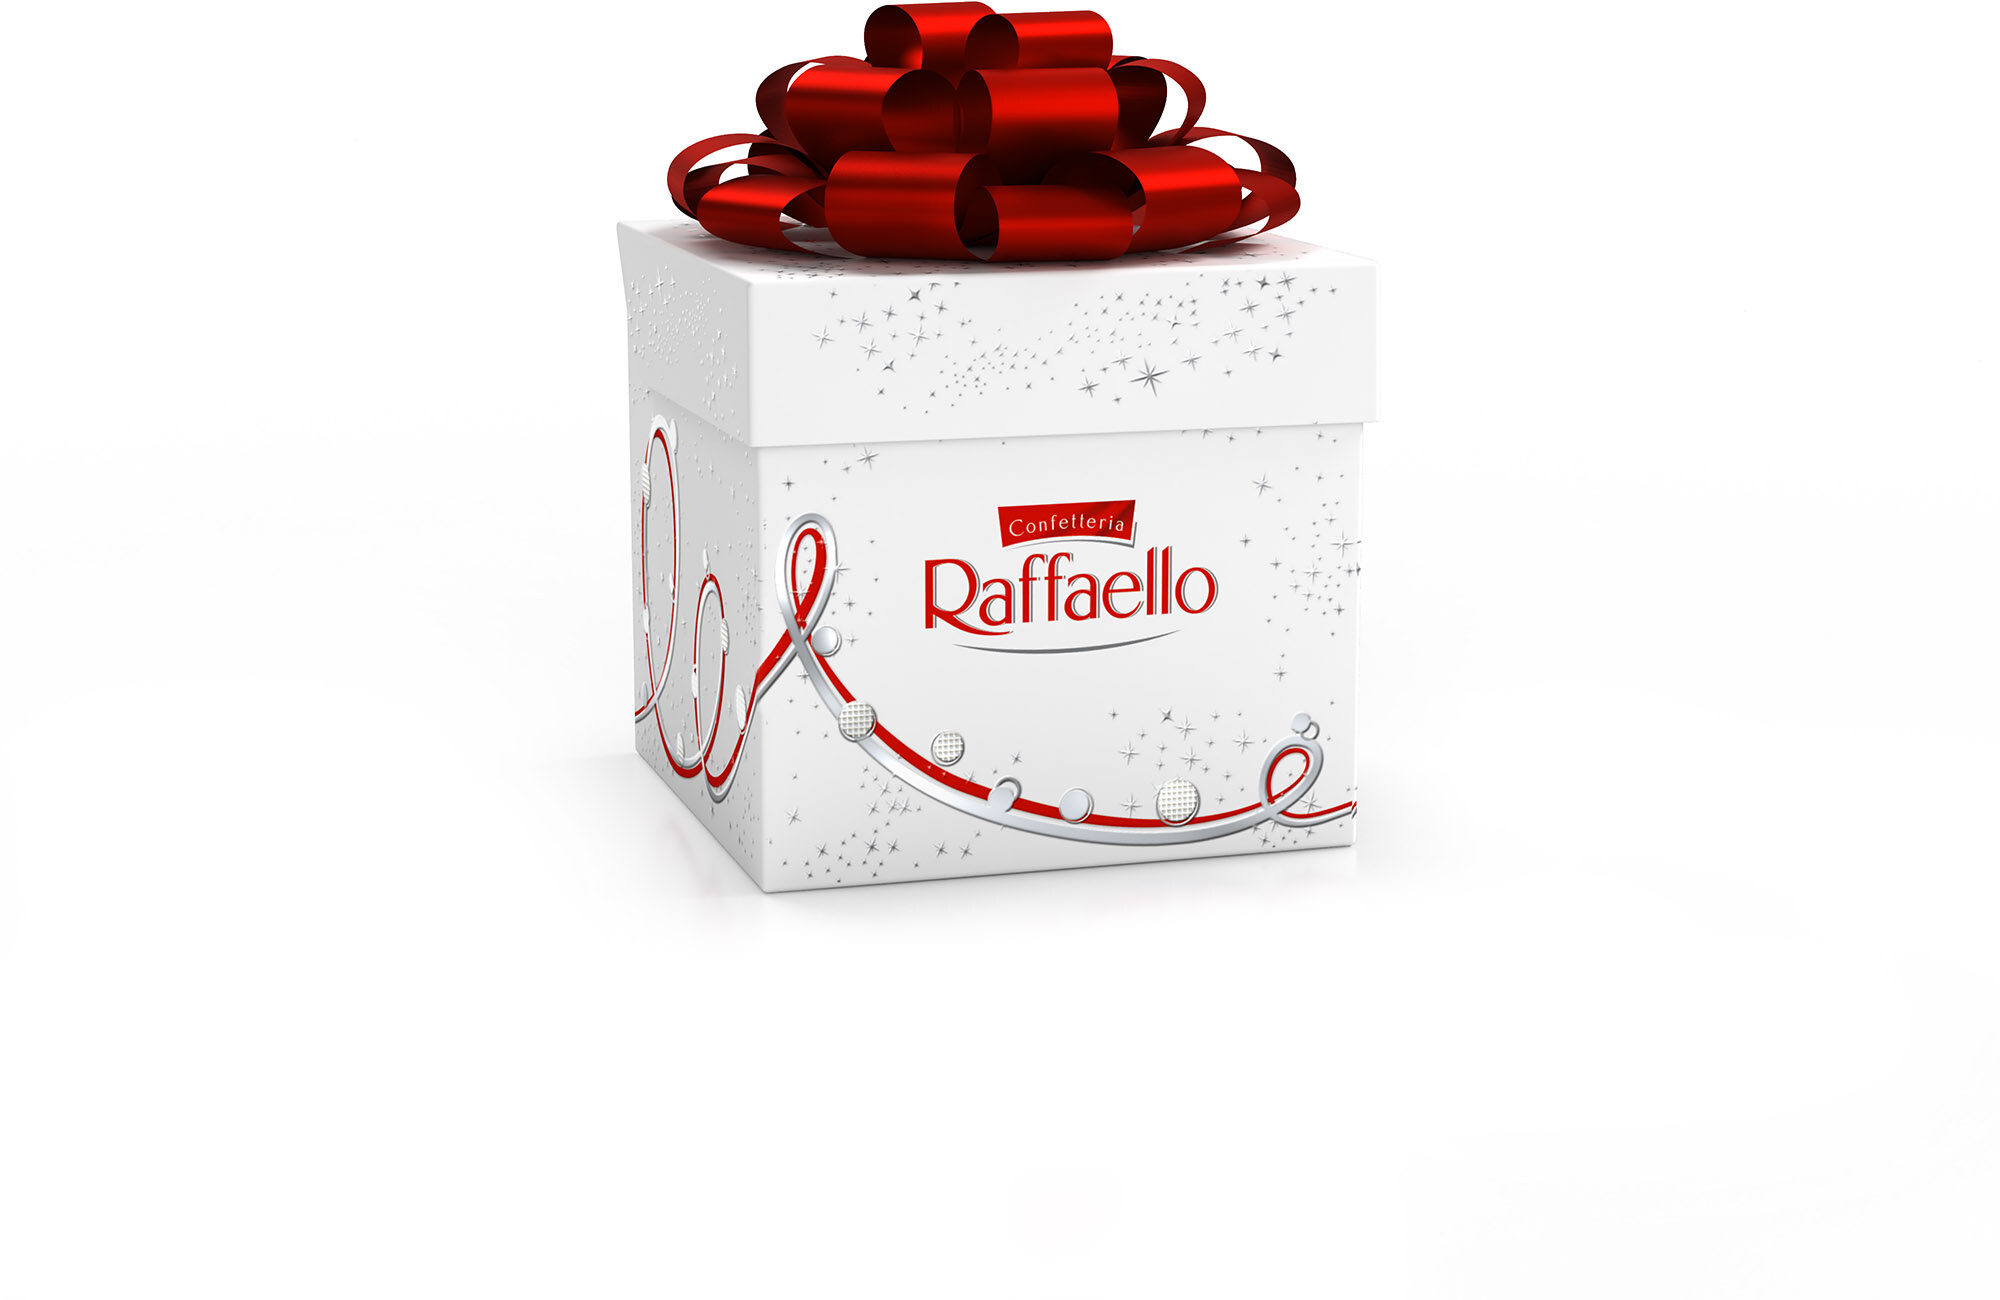 Raffaello fines gaufrettes enrobees de noix de coco fourrees noix de coco avec amande entiere cube de 7 pieces - Prodotto - fr